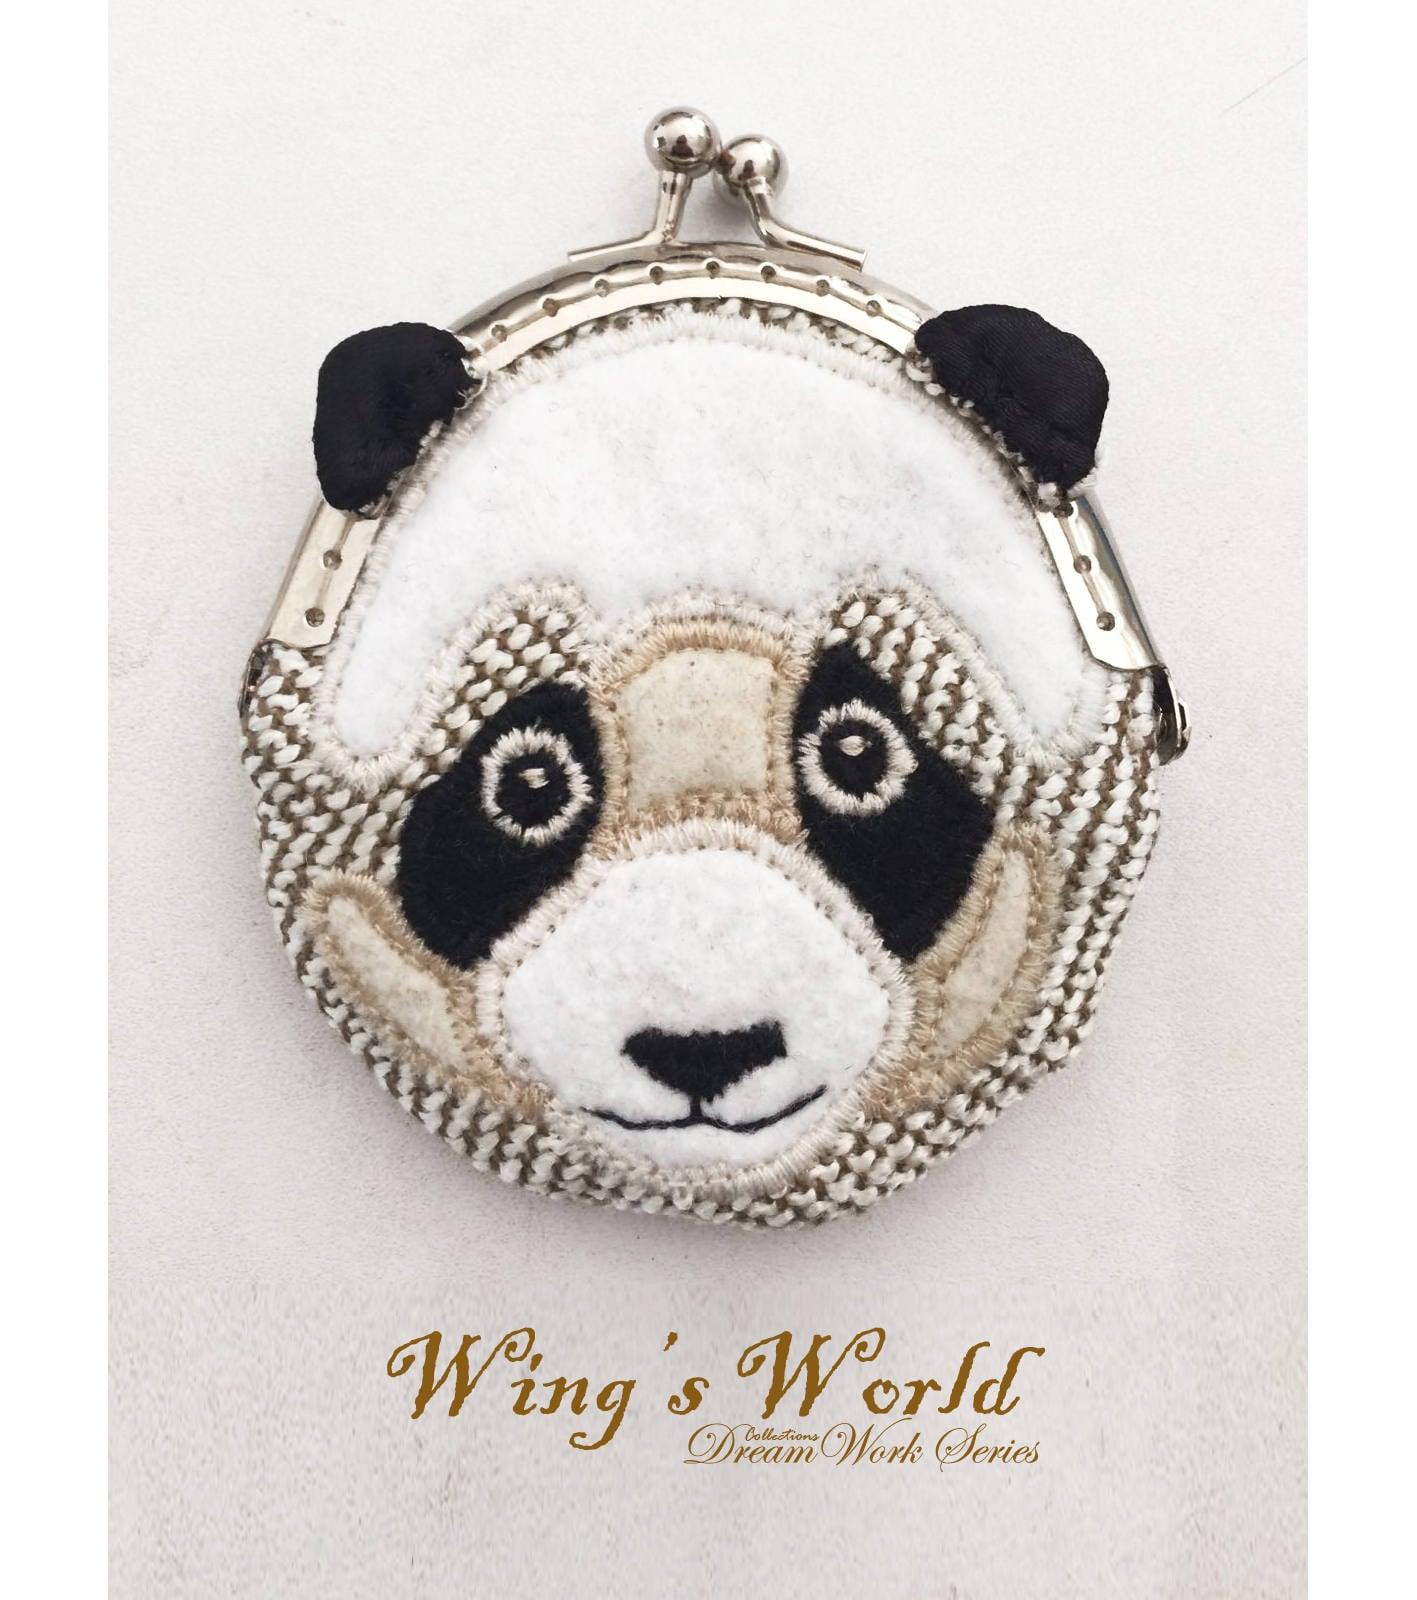 Panda Geldbeutel Geldbörse Panda Hund Geldbörse Filz Panda | Etsy